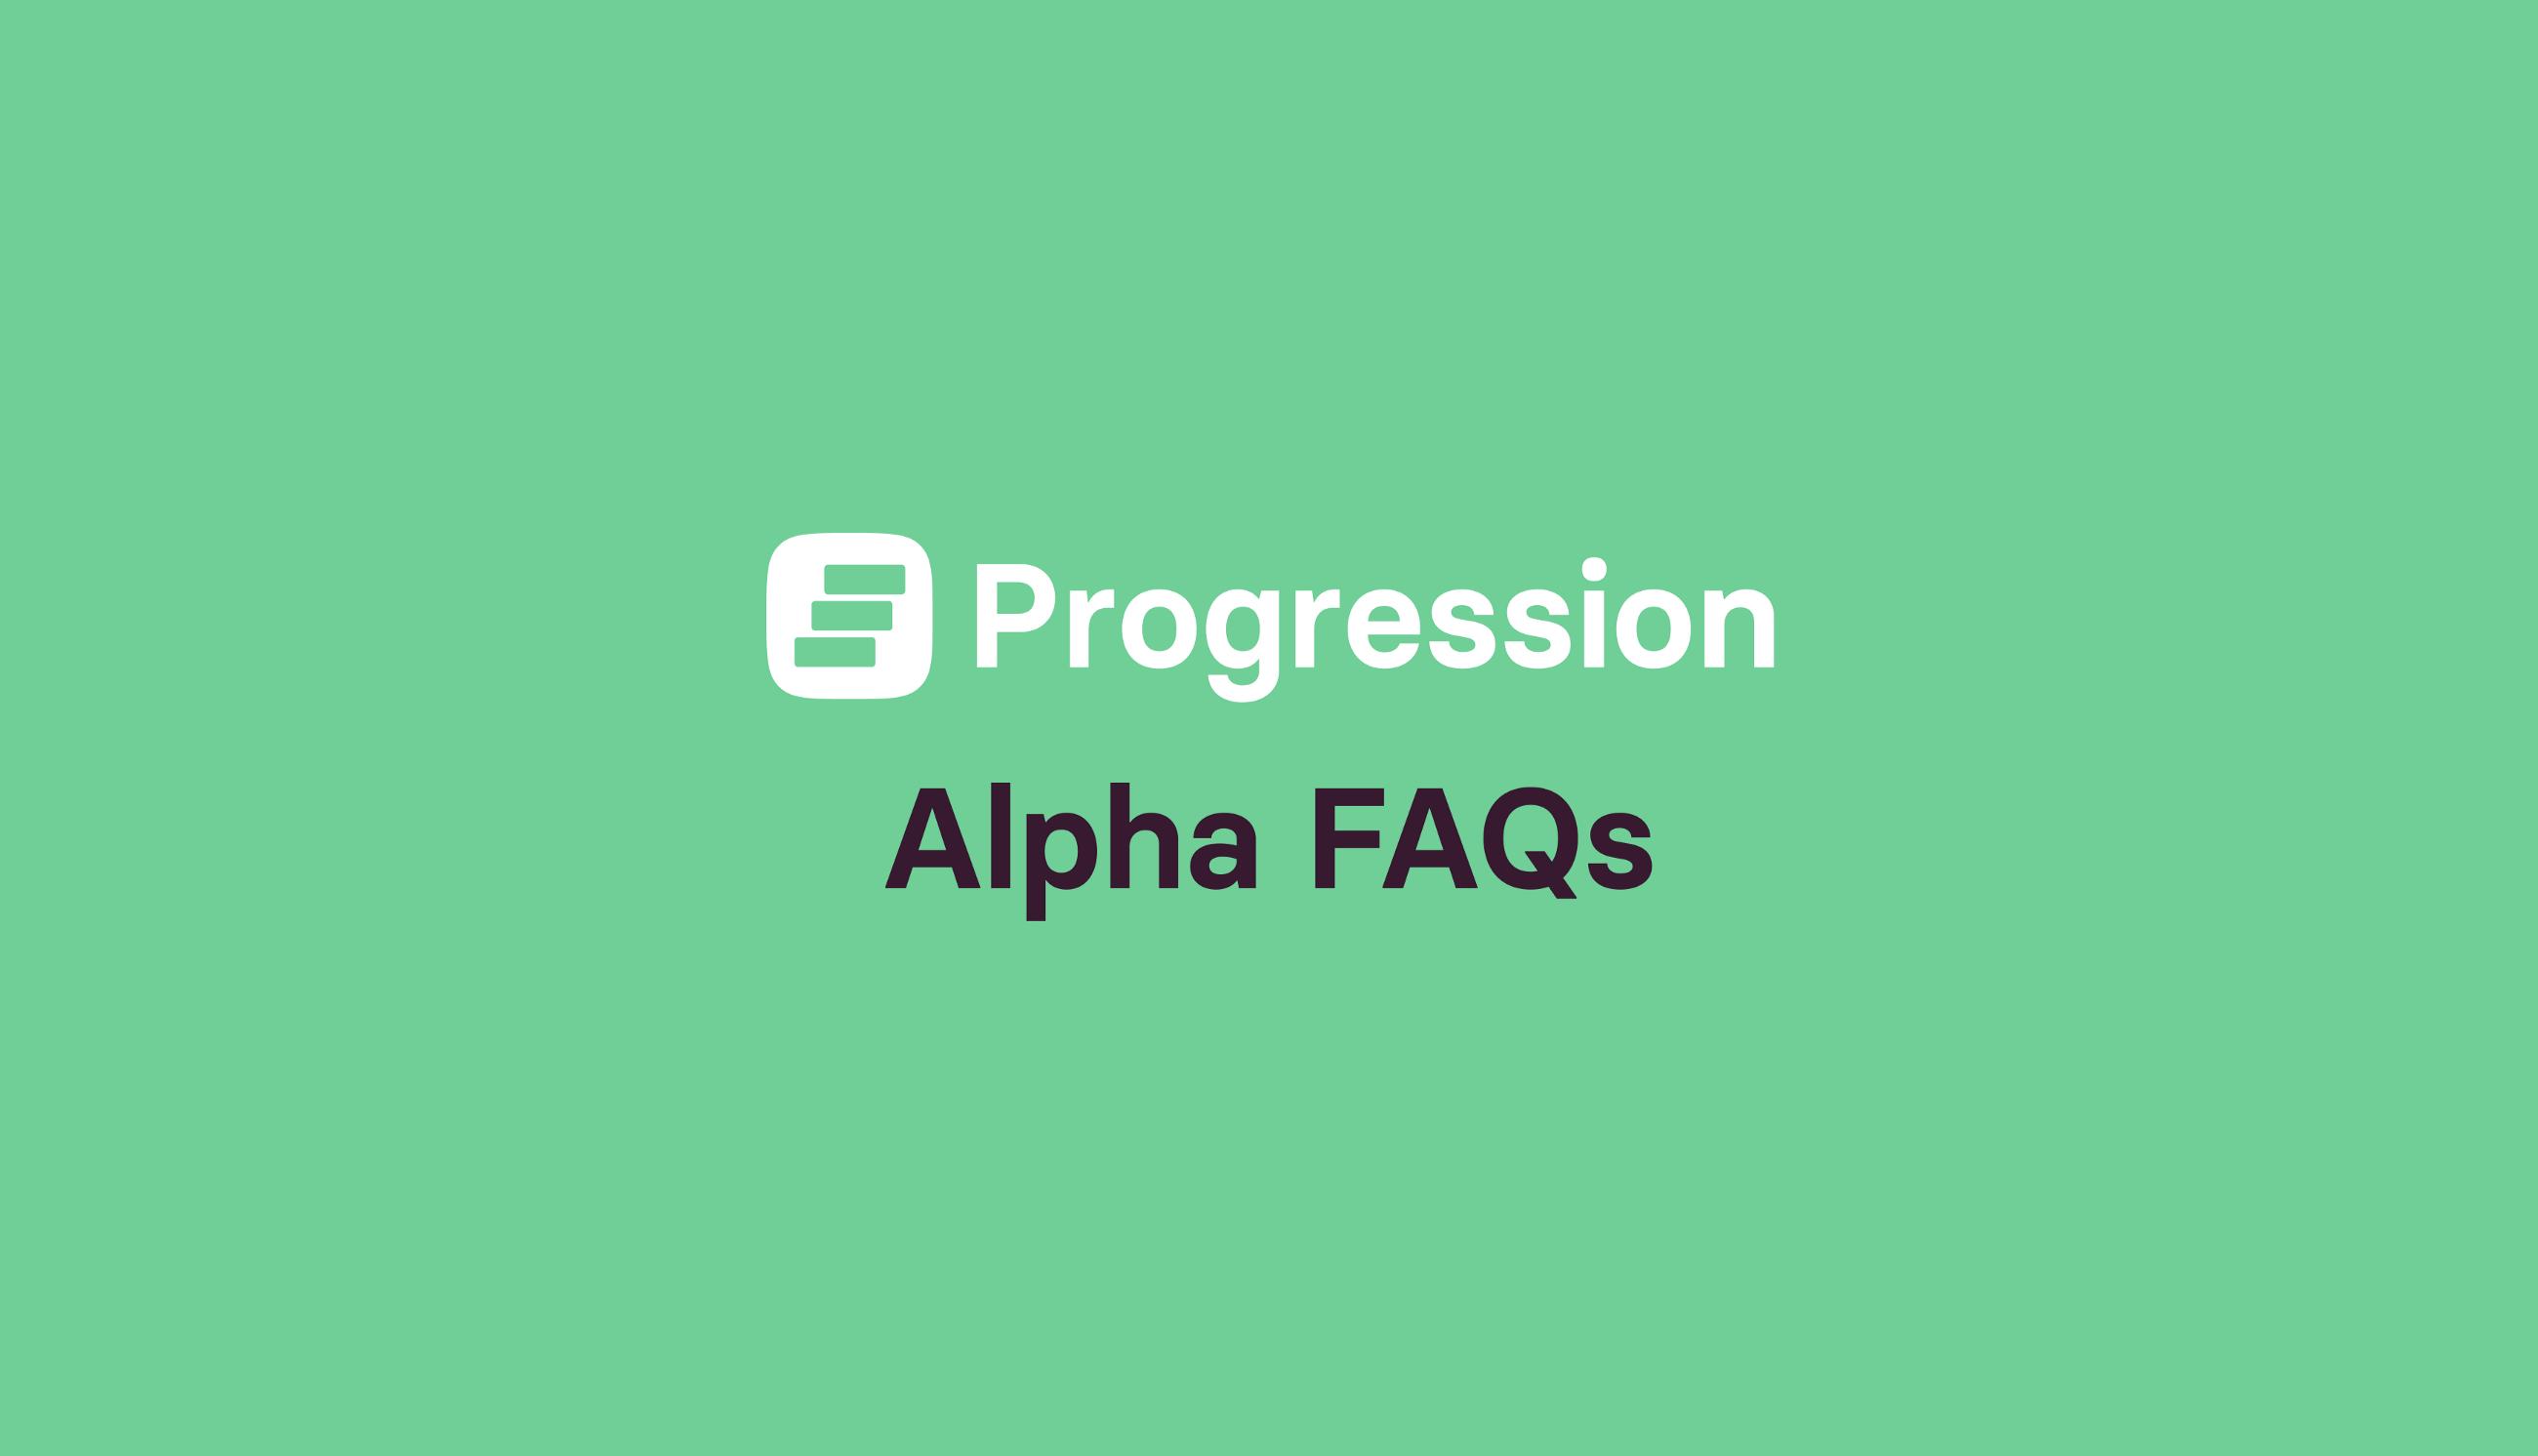 Progression Alpha: FAQ's and pricing